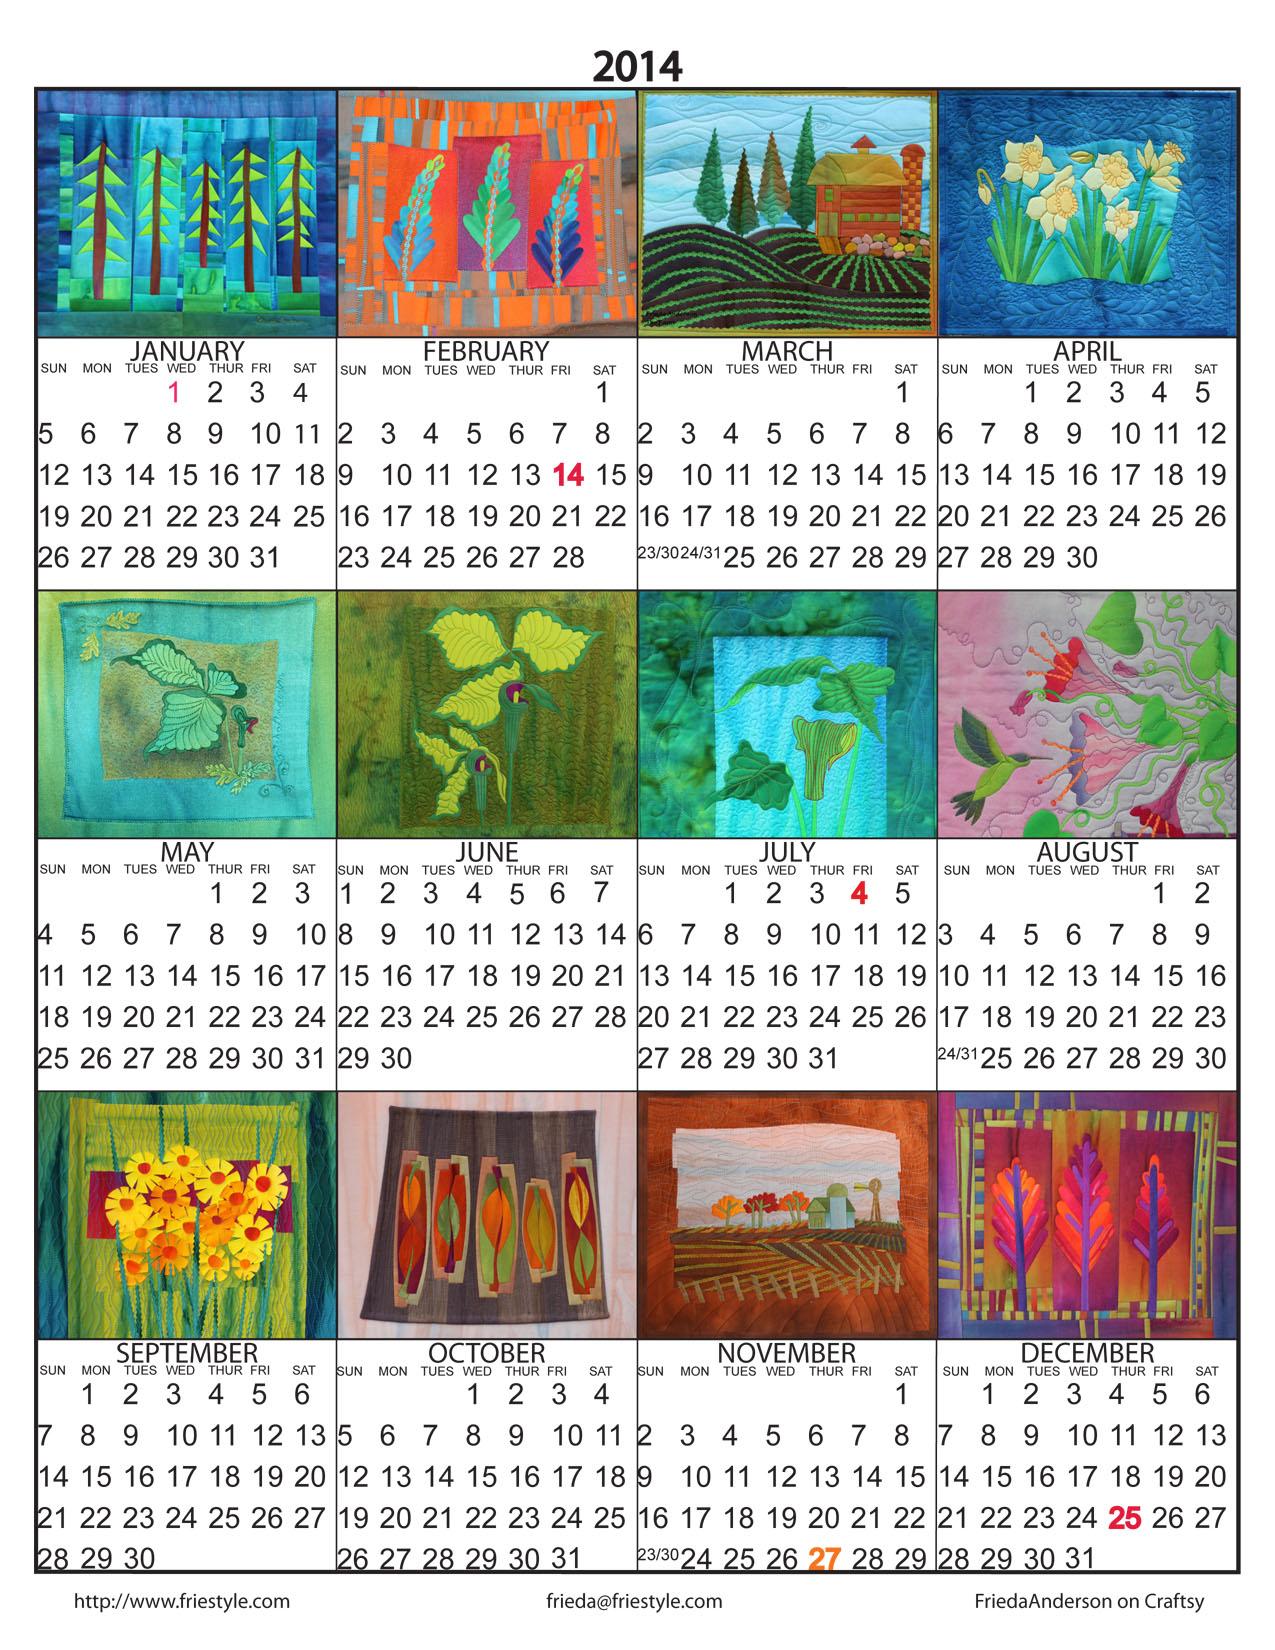 Frieda Anderson 2014 Calendar